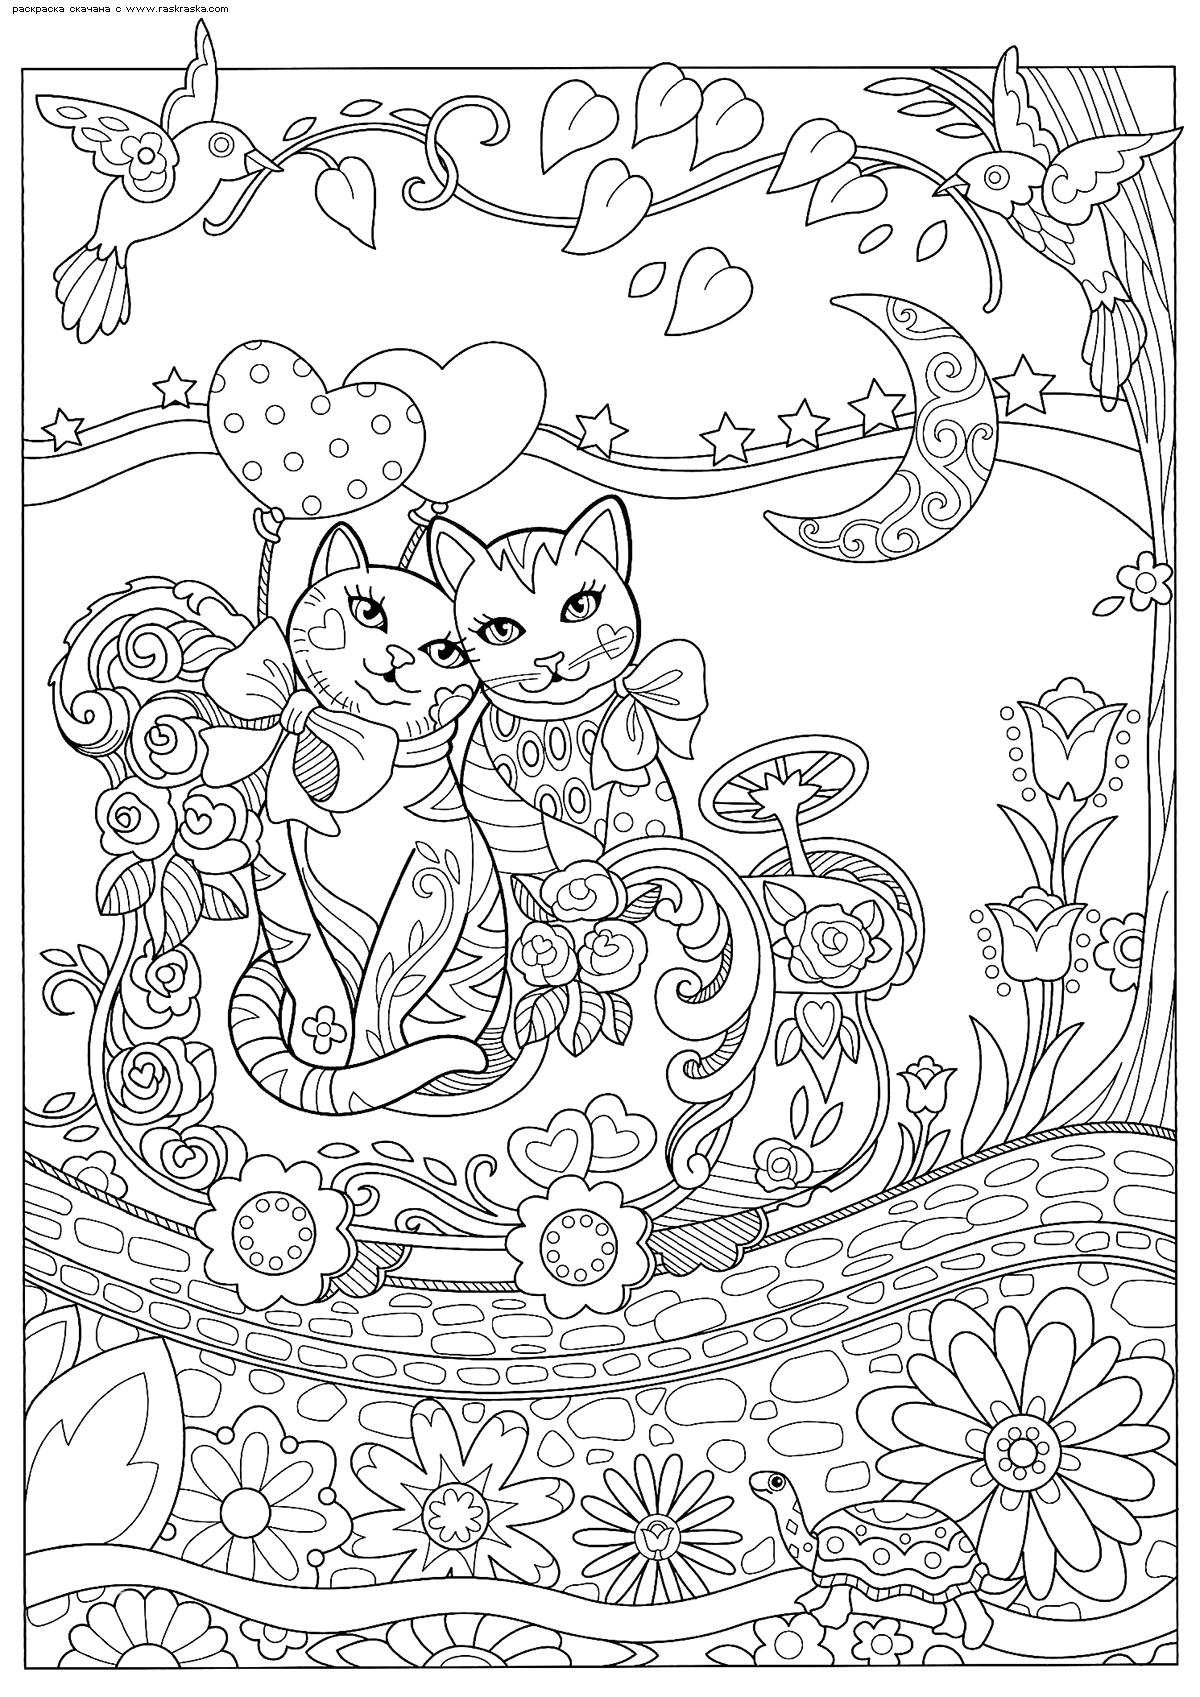 Раскраска Кошки на прогулке | Раскраски антистресс Кошки ...